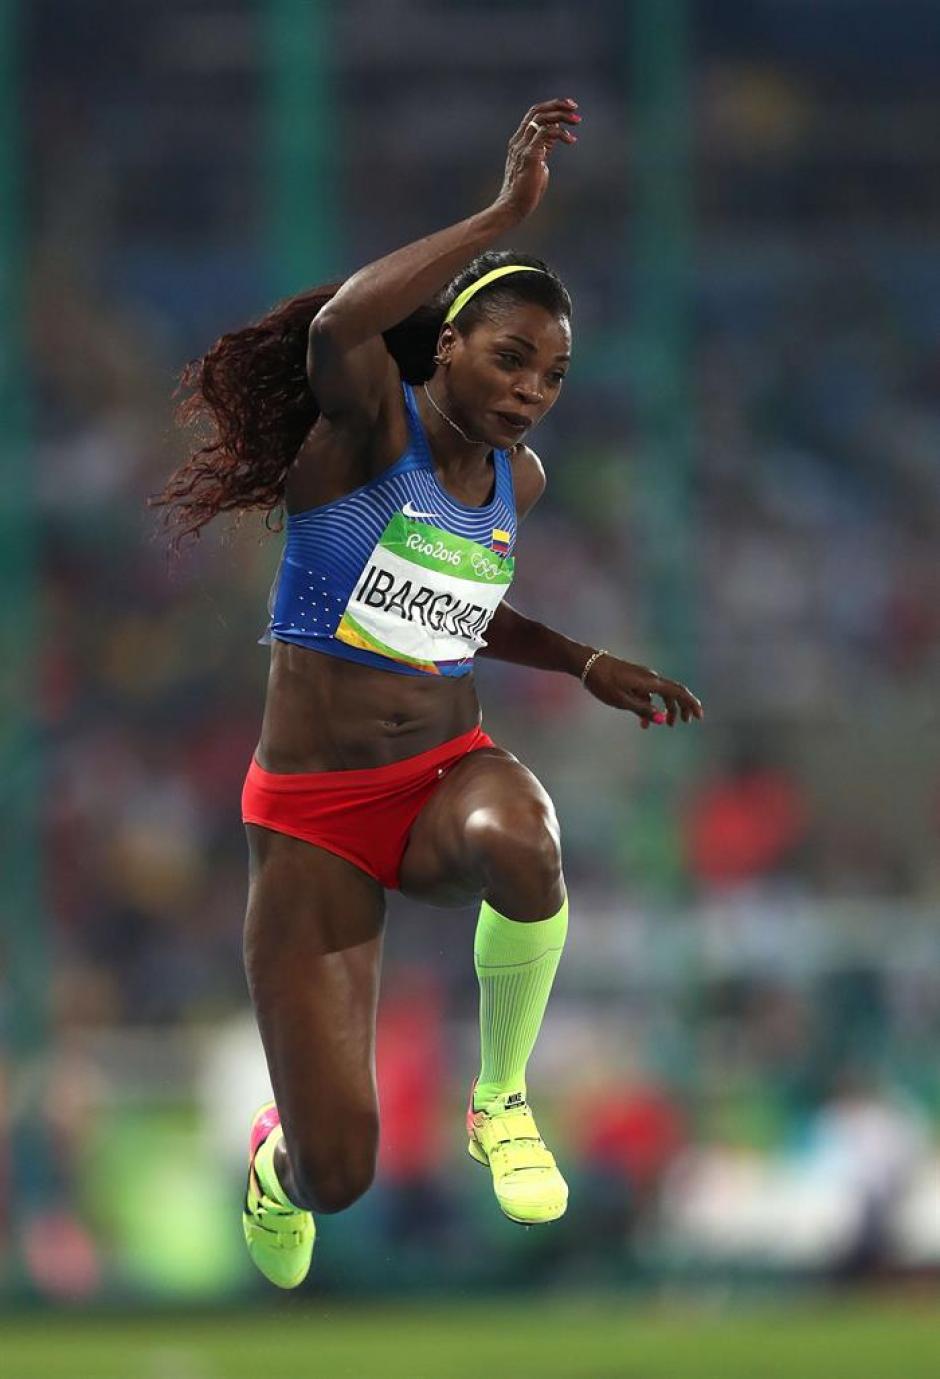 Ibarguen da un nuevo salto a la gloria y le da otra medalla a Colombia. (Foto: EFE)